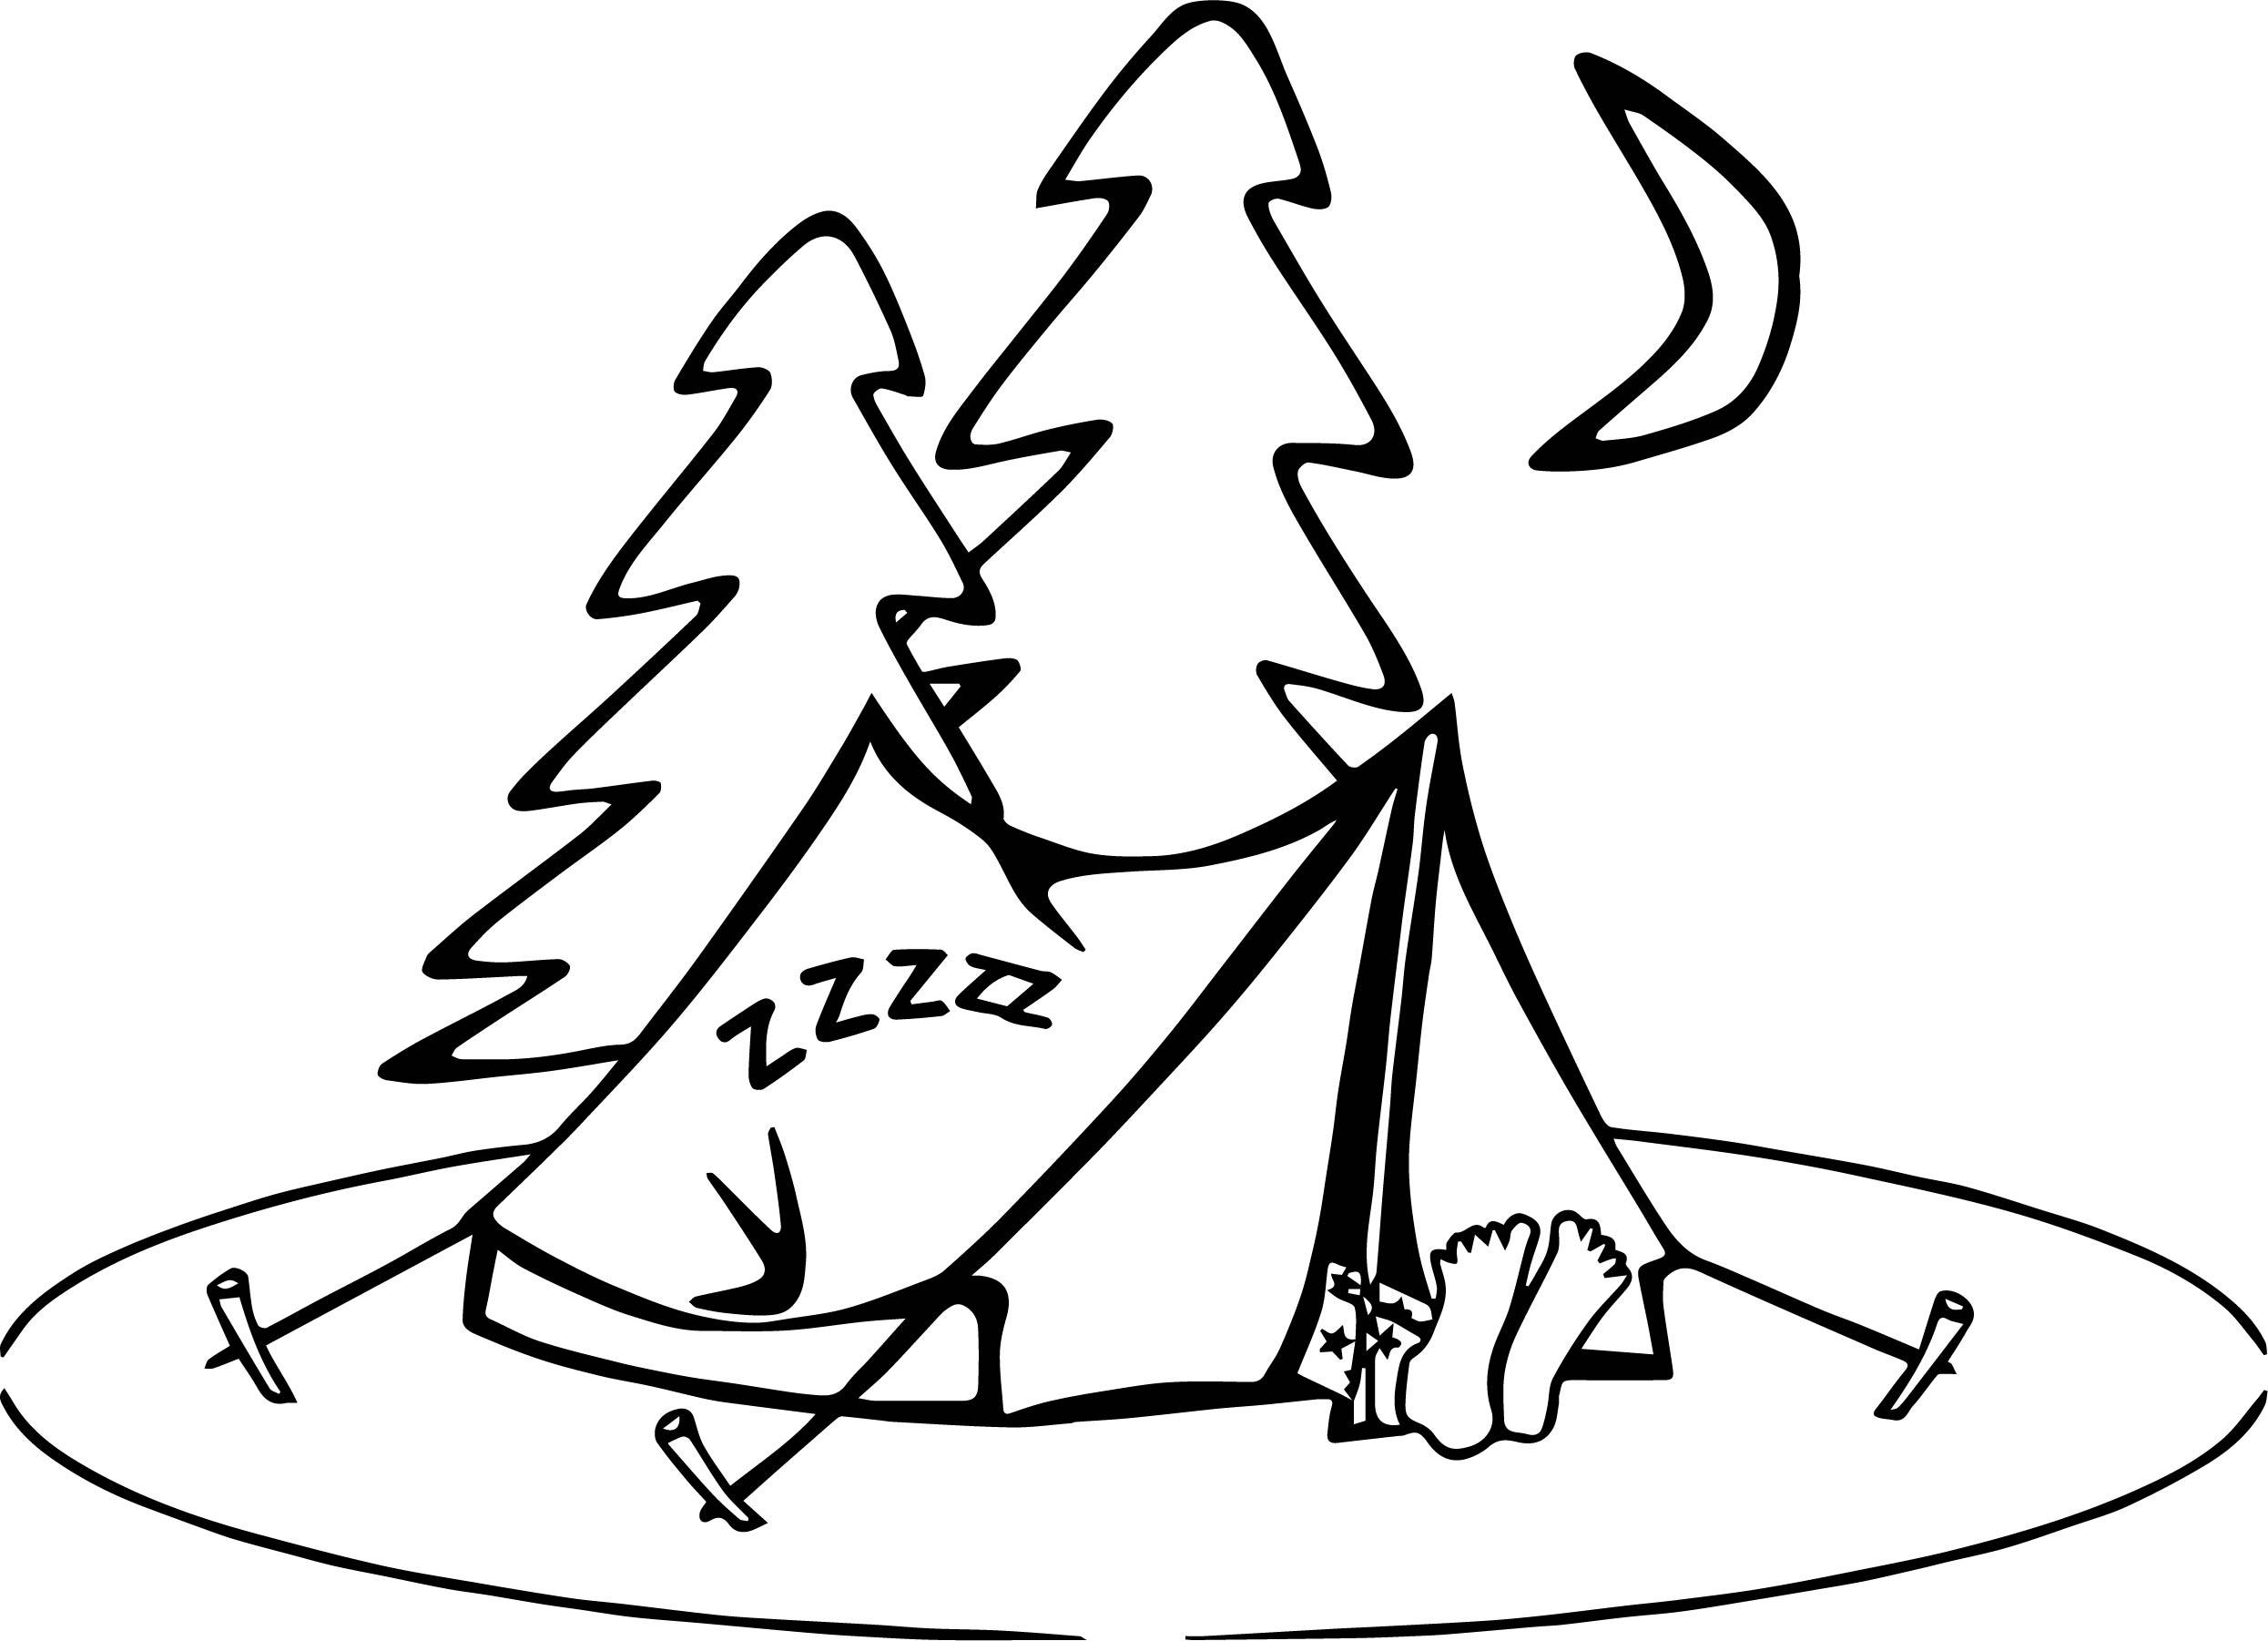 Camping Sleeping Coloring Page